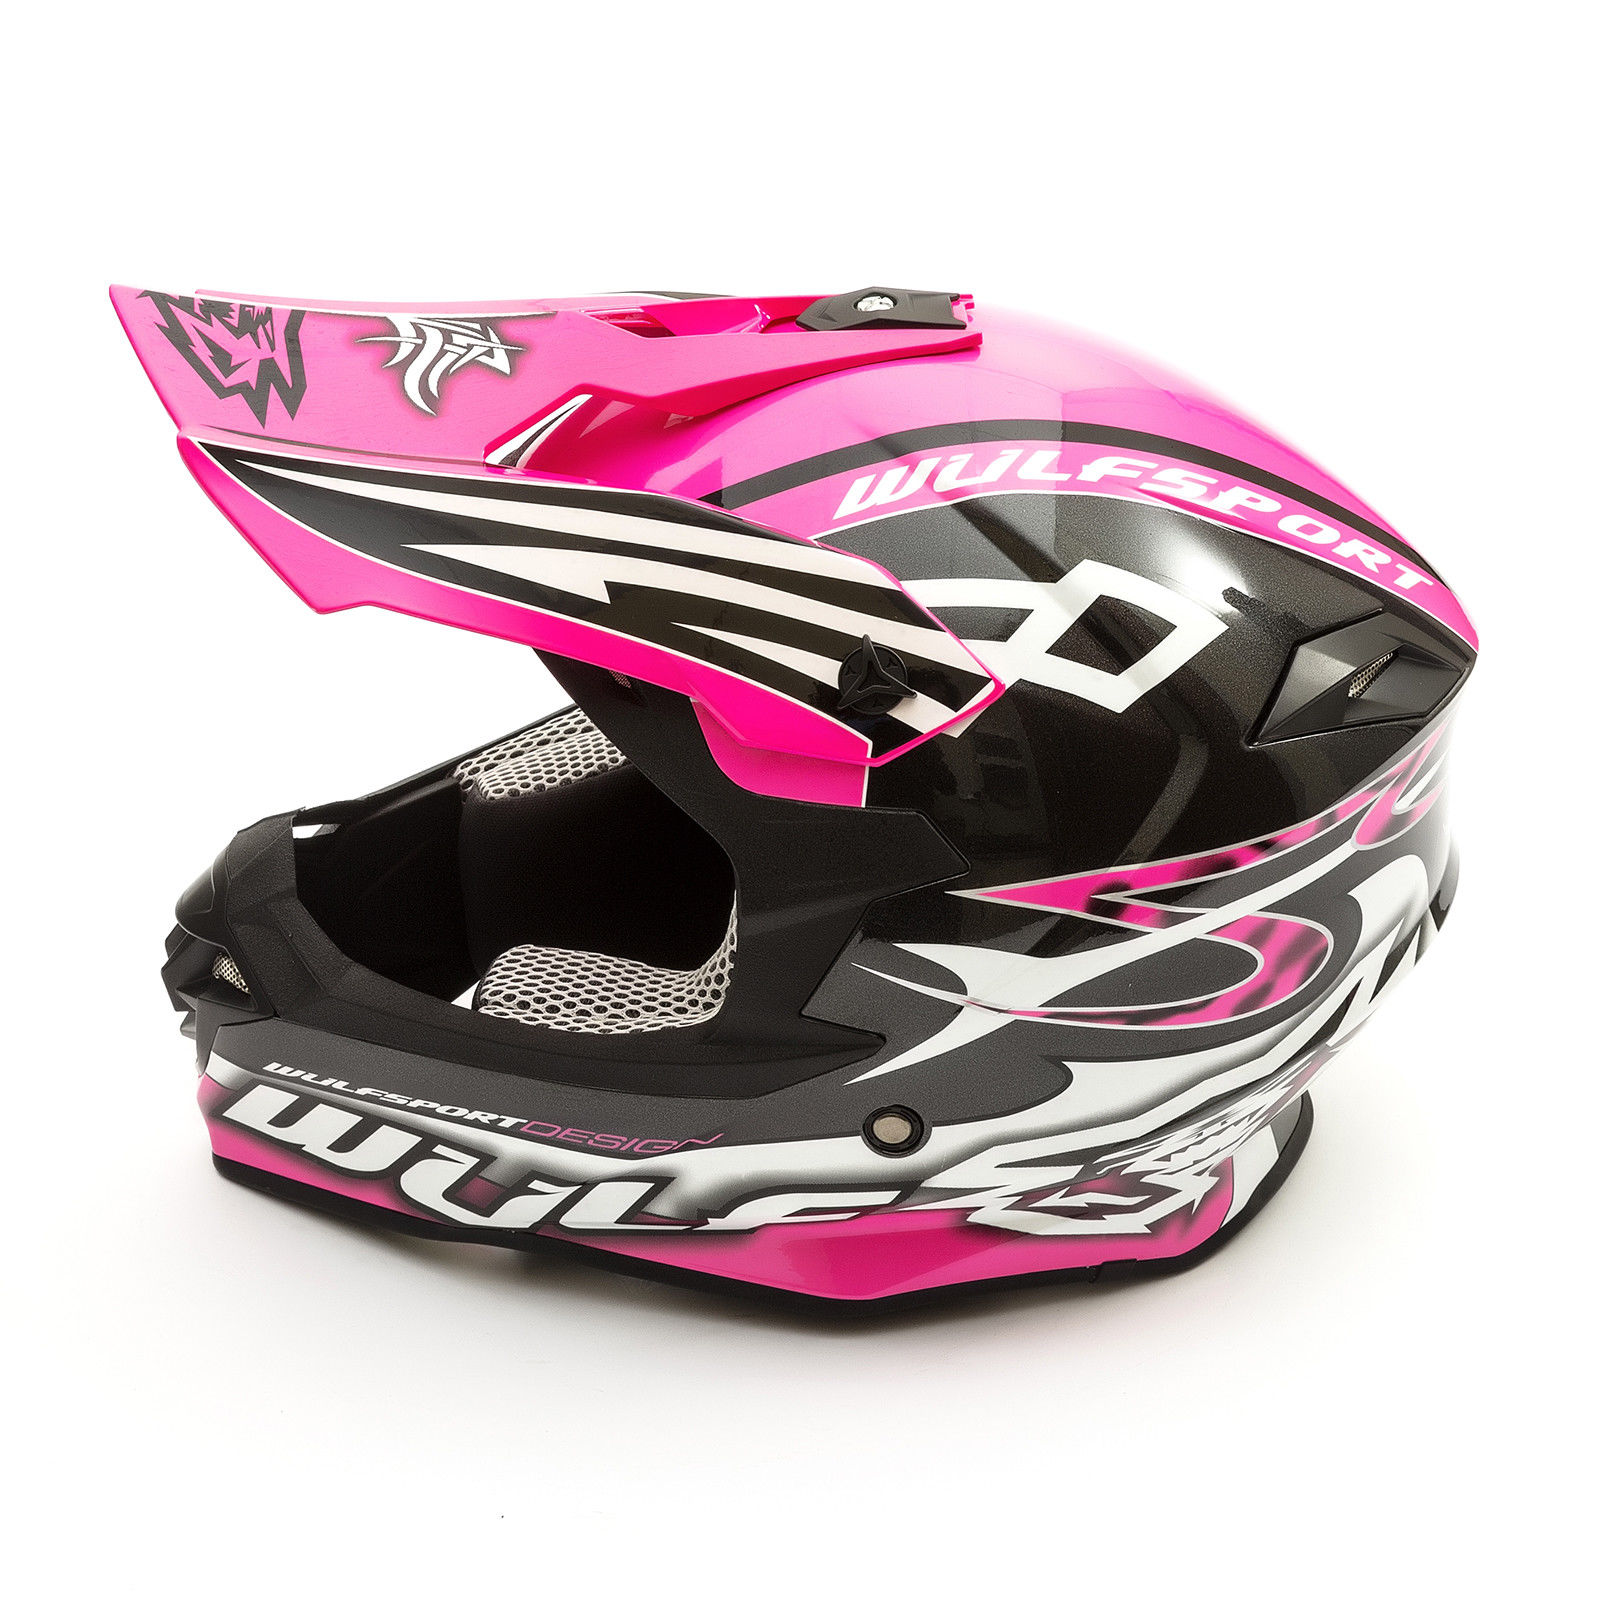 Wulfsport-Adult-Sceptre-Helmets-Motocross-Pitbike-Motorbike-Off-Road-Racing-ATV thumbnail 40